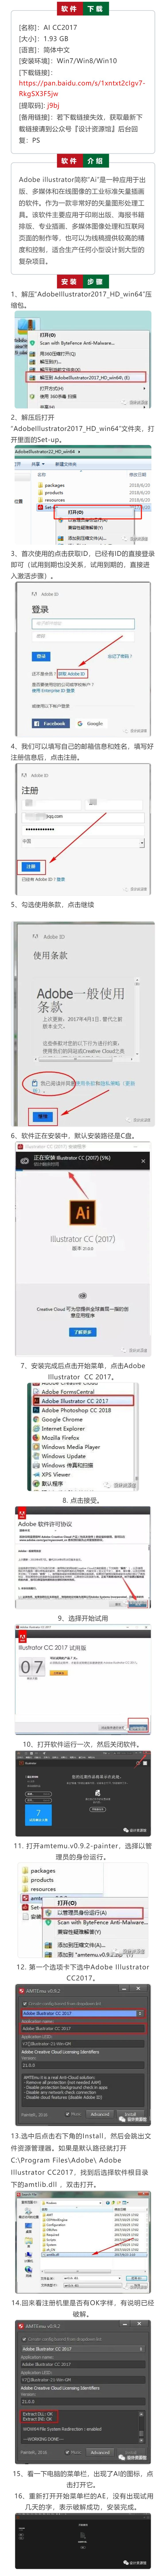 Illustrator CC 2017安装包及教程